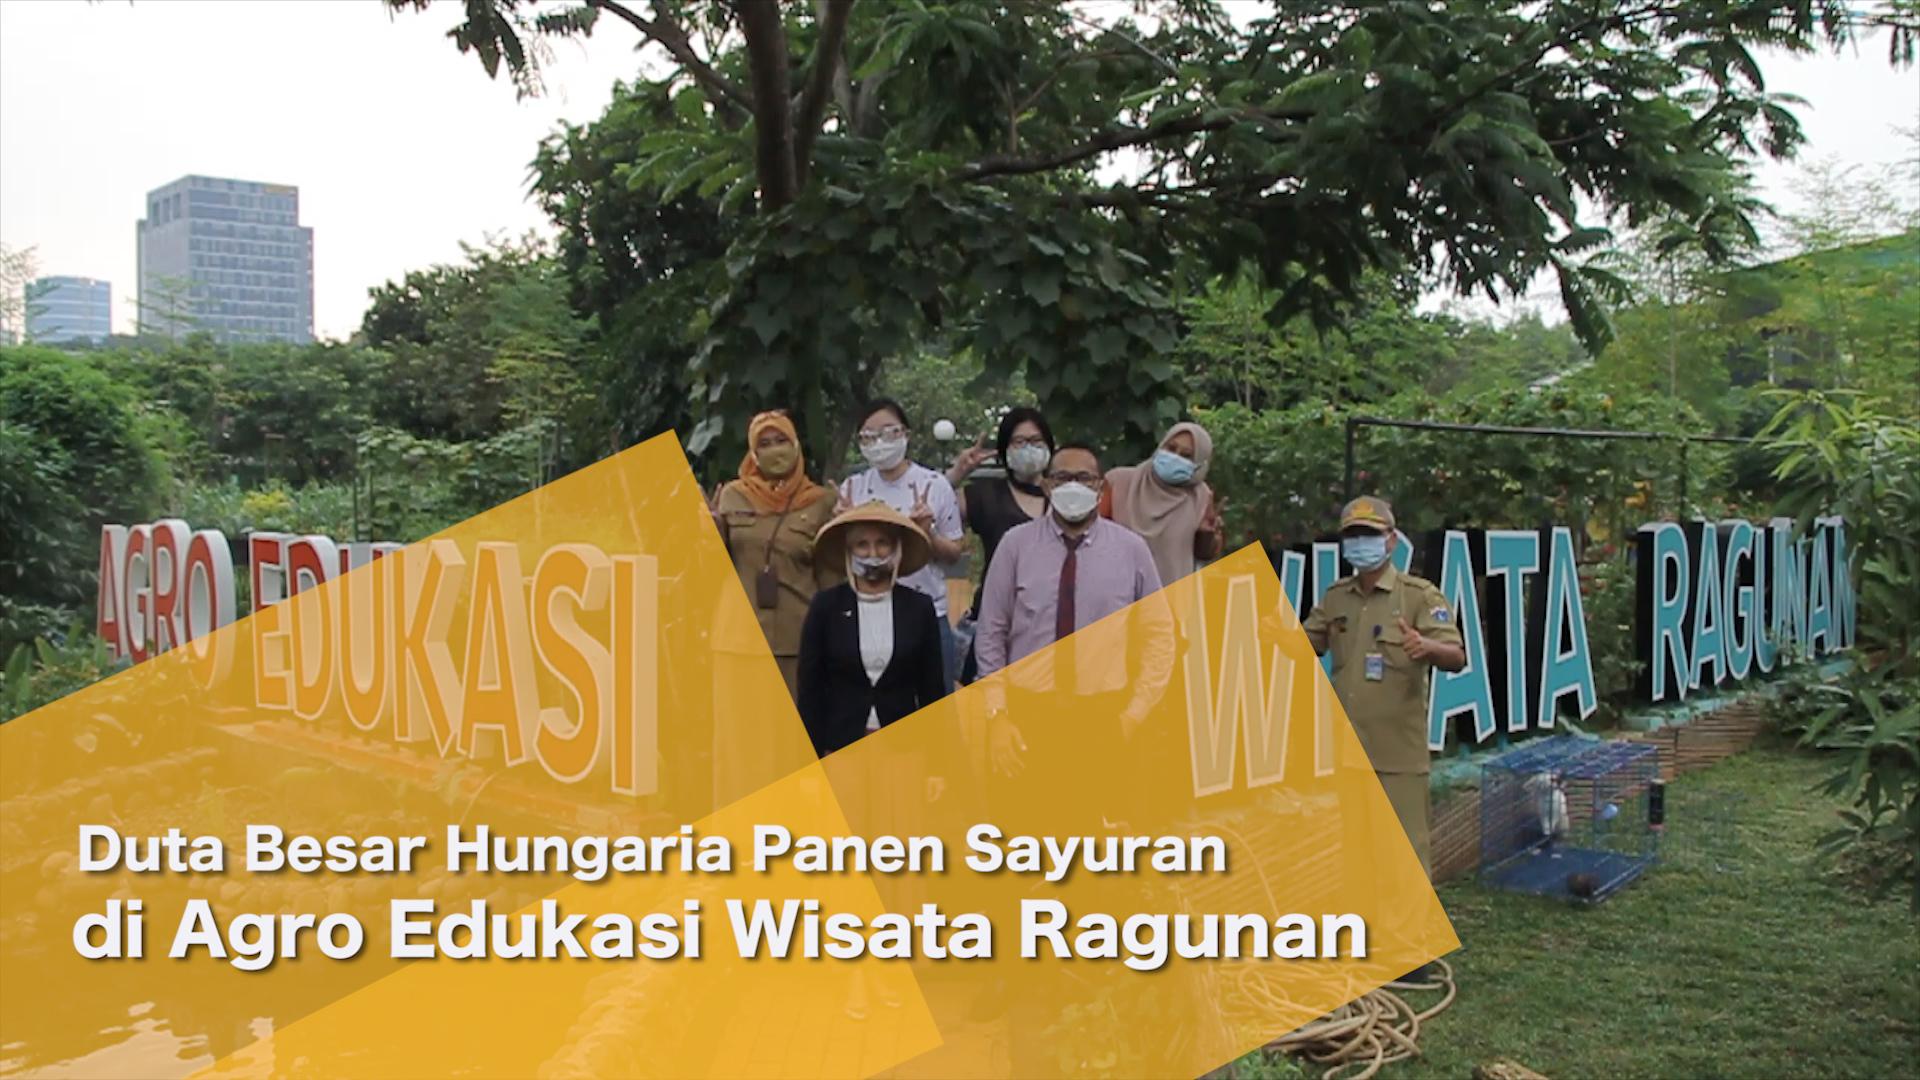 0706_aqil_Duta Besar Hungaria Panen Sayuran di Agro Edukasi Wisata Ragunan.mp4